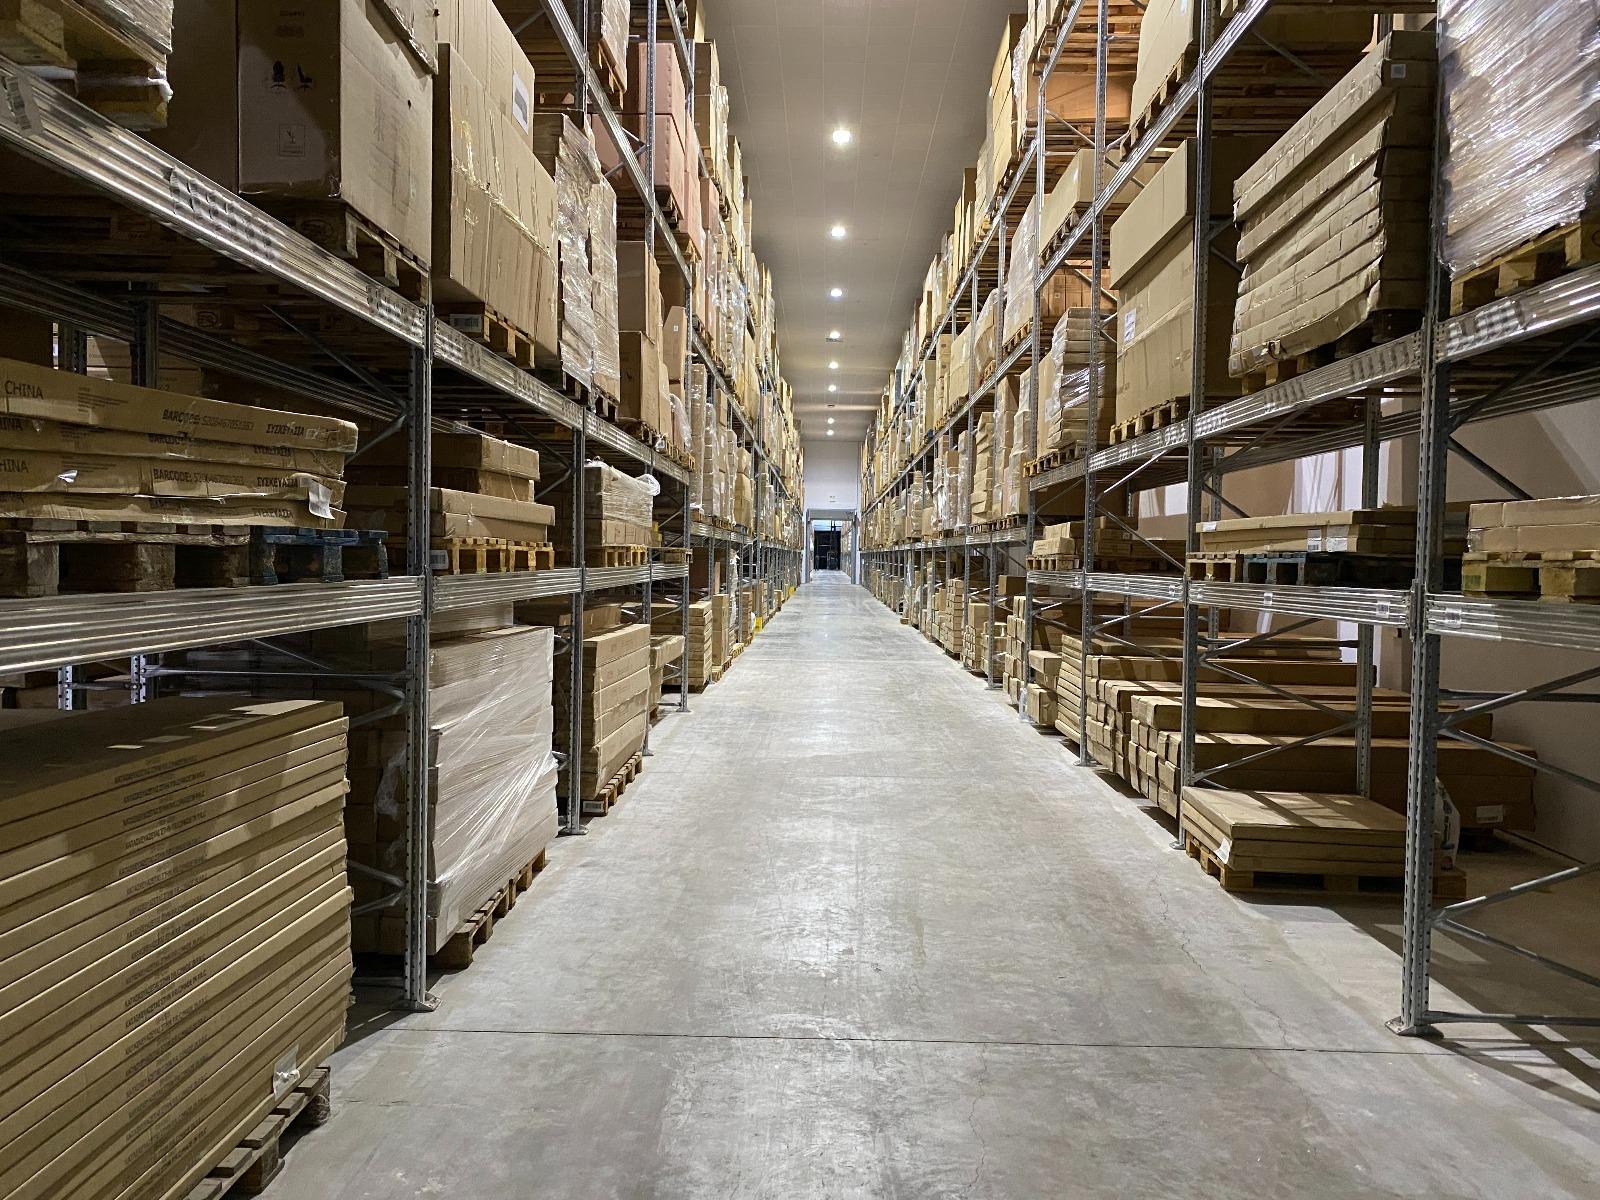 Logistics warehouse image #1